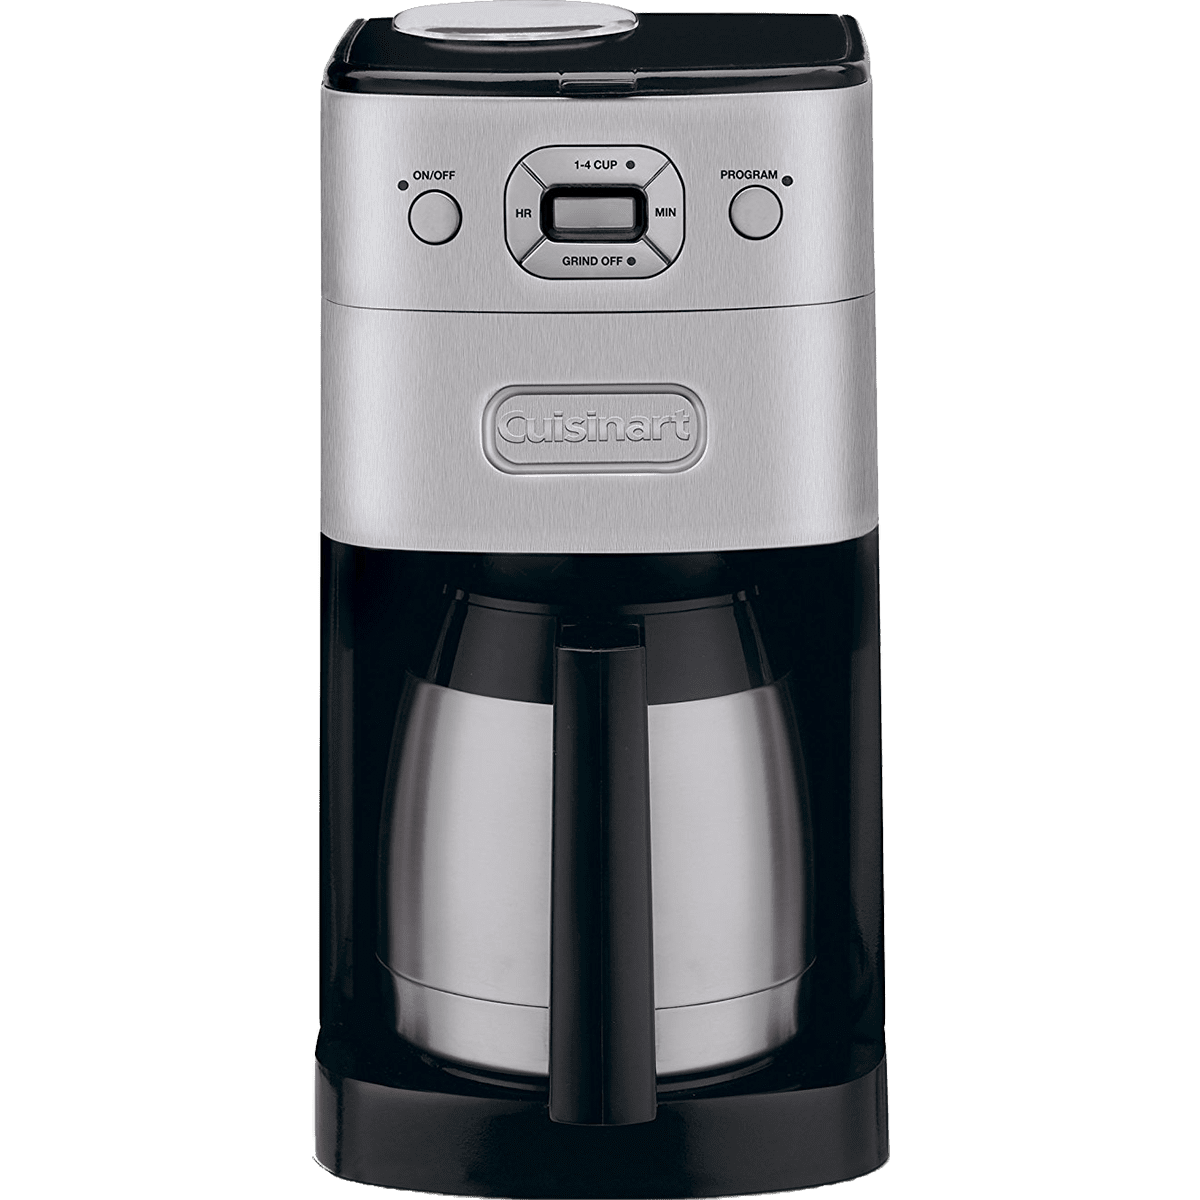 Cuisinart Dgb 625bc Grind & Brew Coffee Maker : Cuisinart Grind & Brew Coffee Maker (DGB-625BC) Quench Essentials